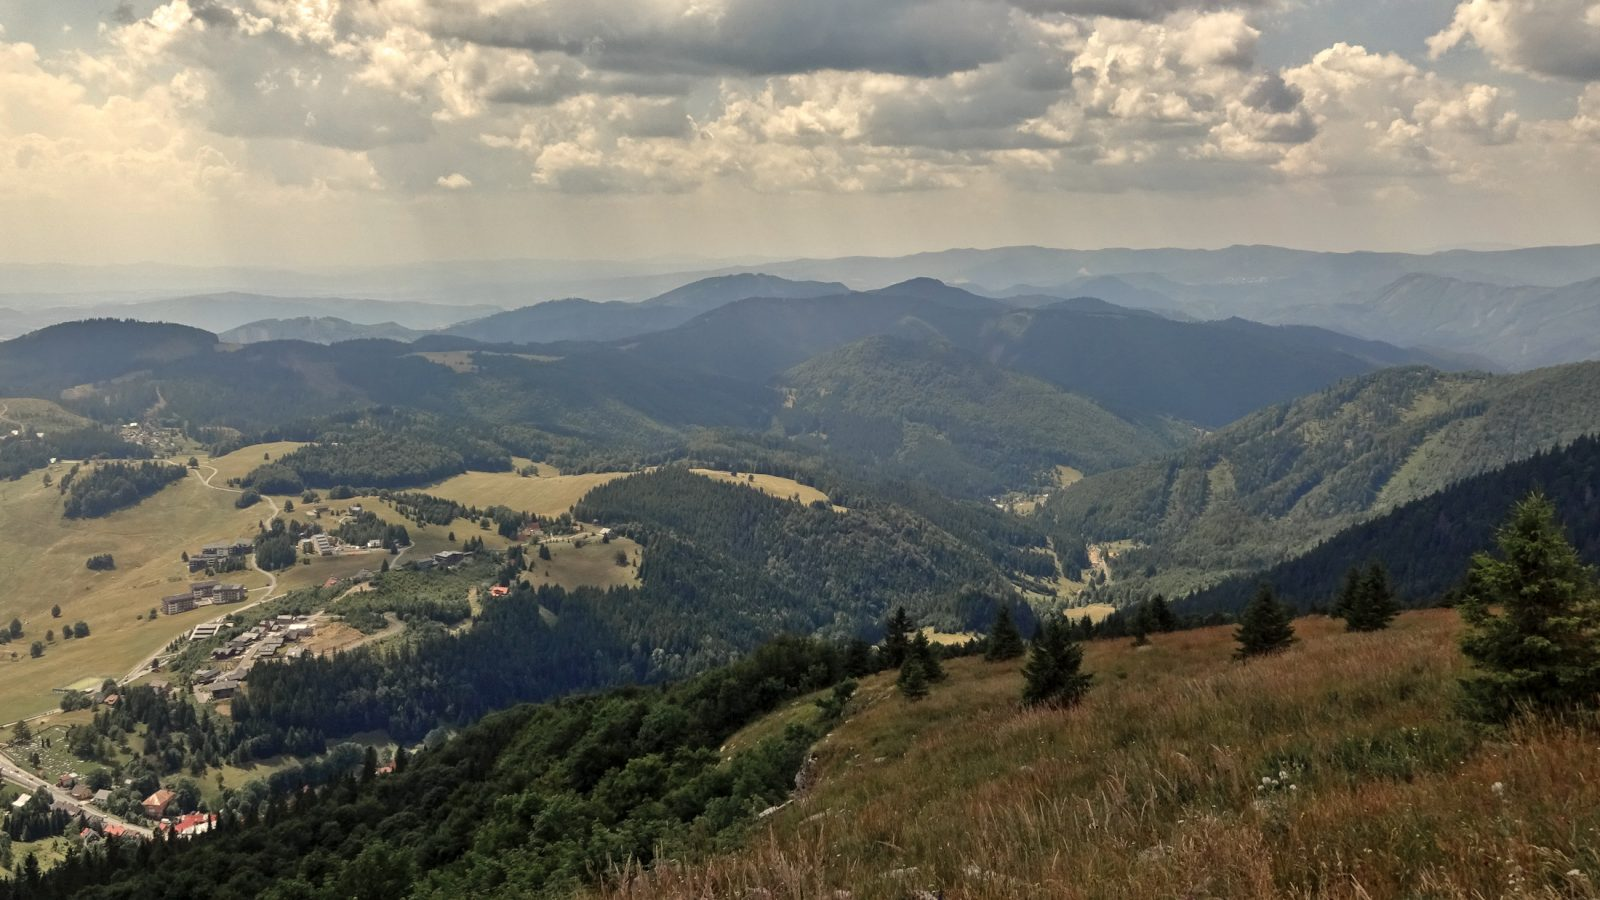 Wielka Fatra - Zvolen 1402 m Relacje